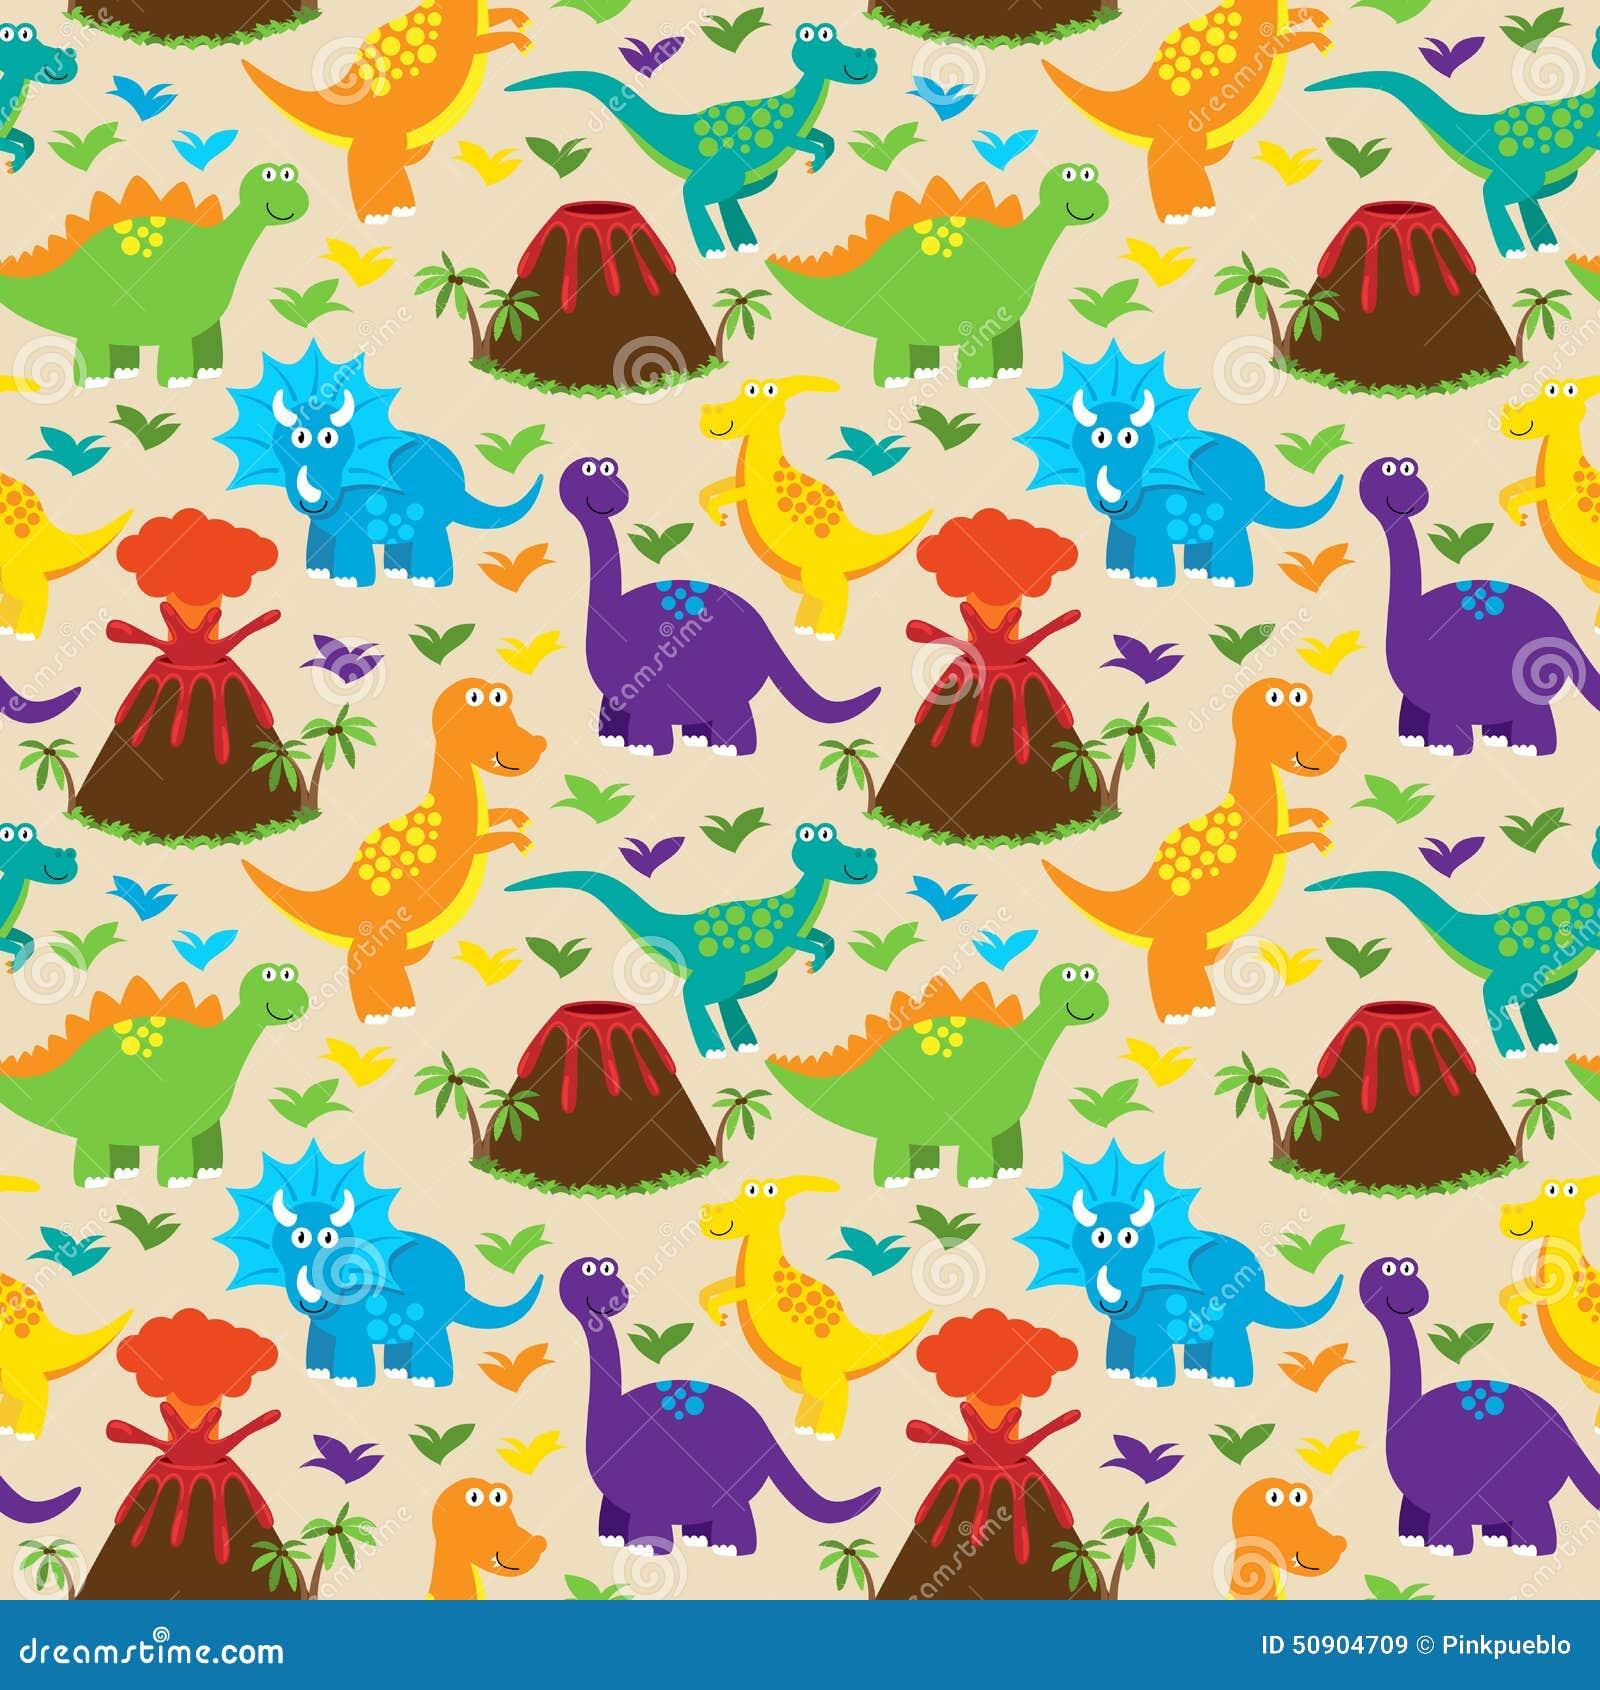 Dinosaur seamless tileable vector background pattern stock vector image 50904709 - Paperboy dinosaur wallpaper ...